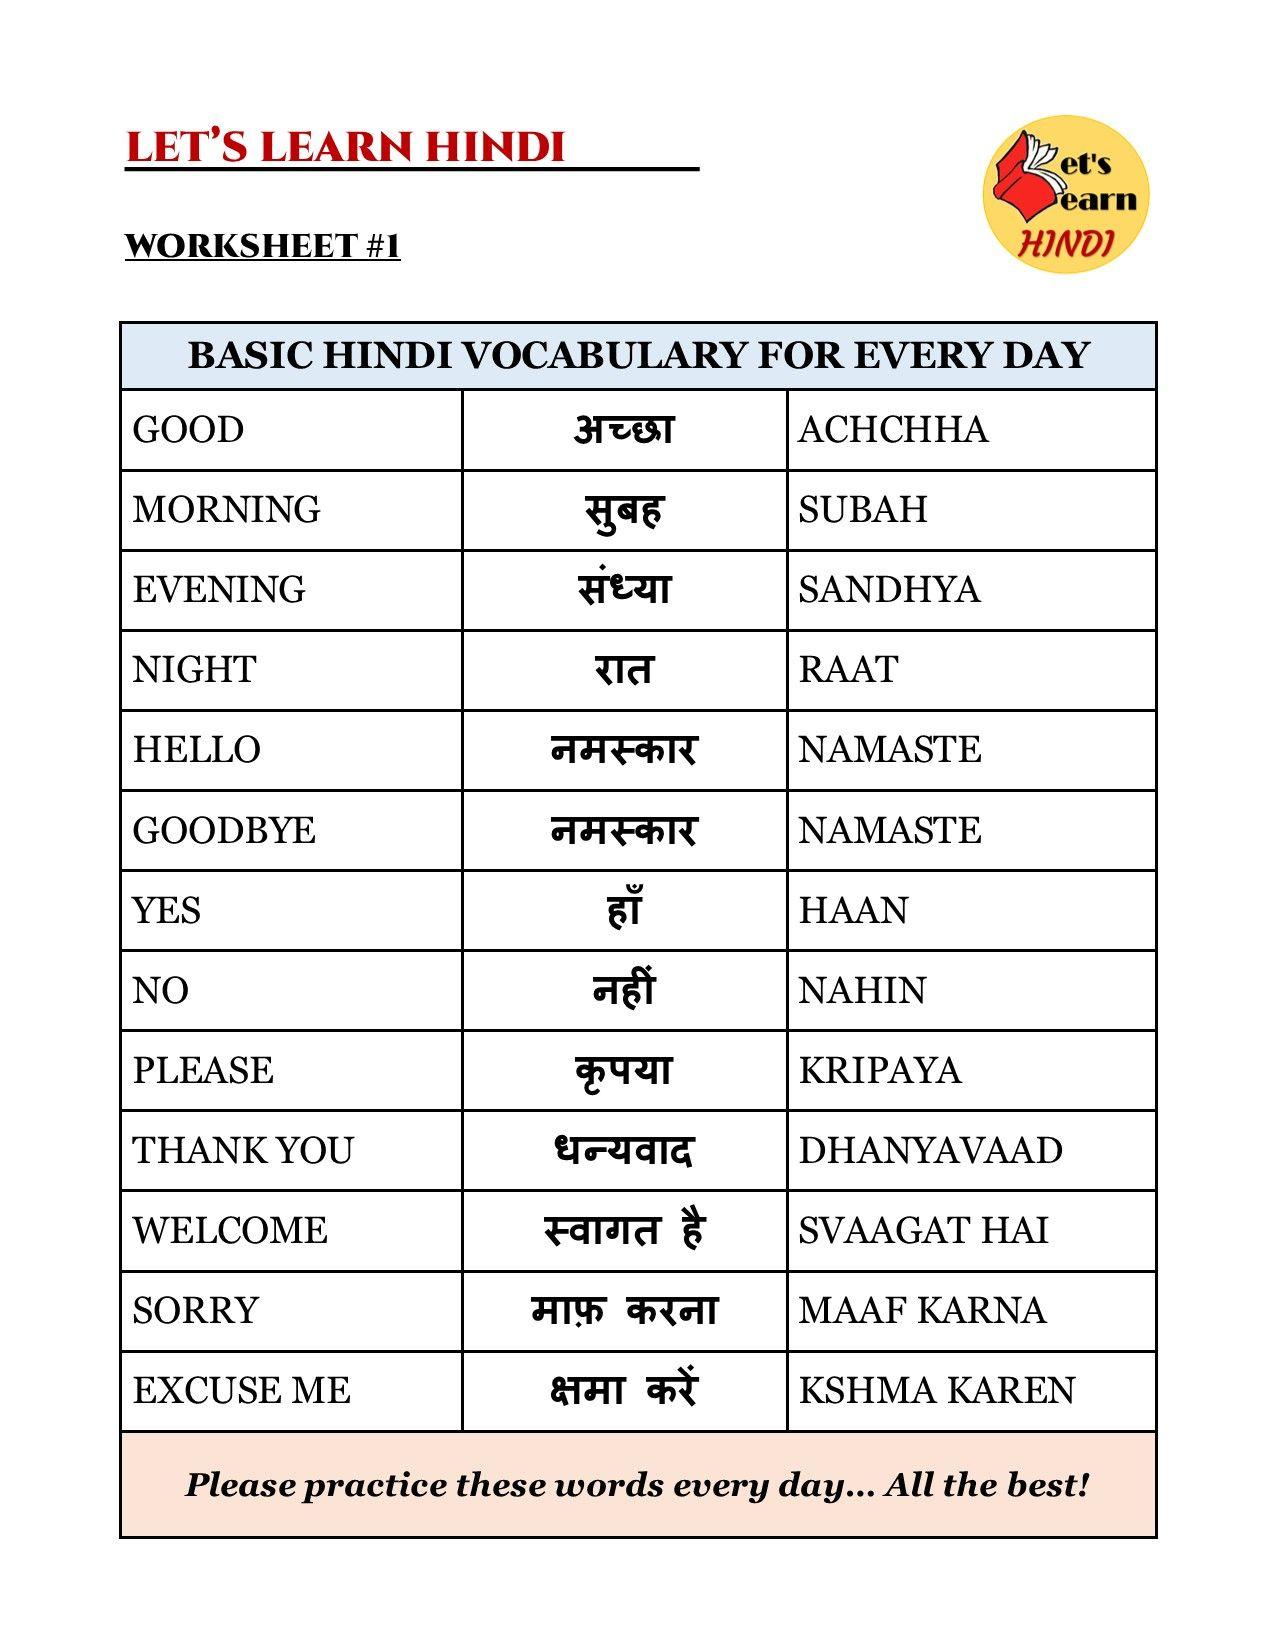 Hindi Vocabulary Worksheet 1 In